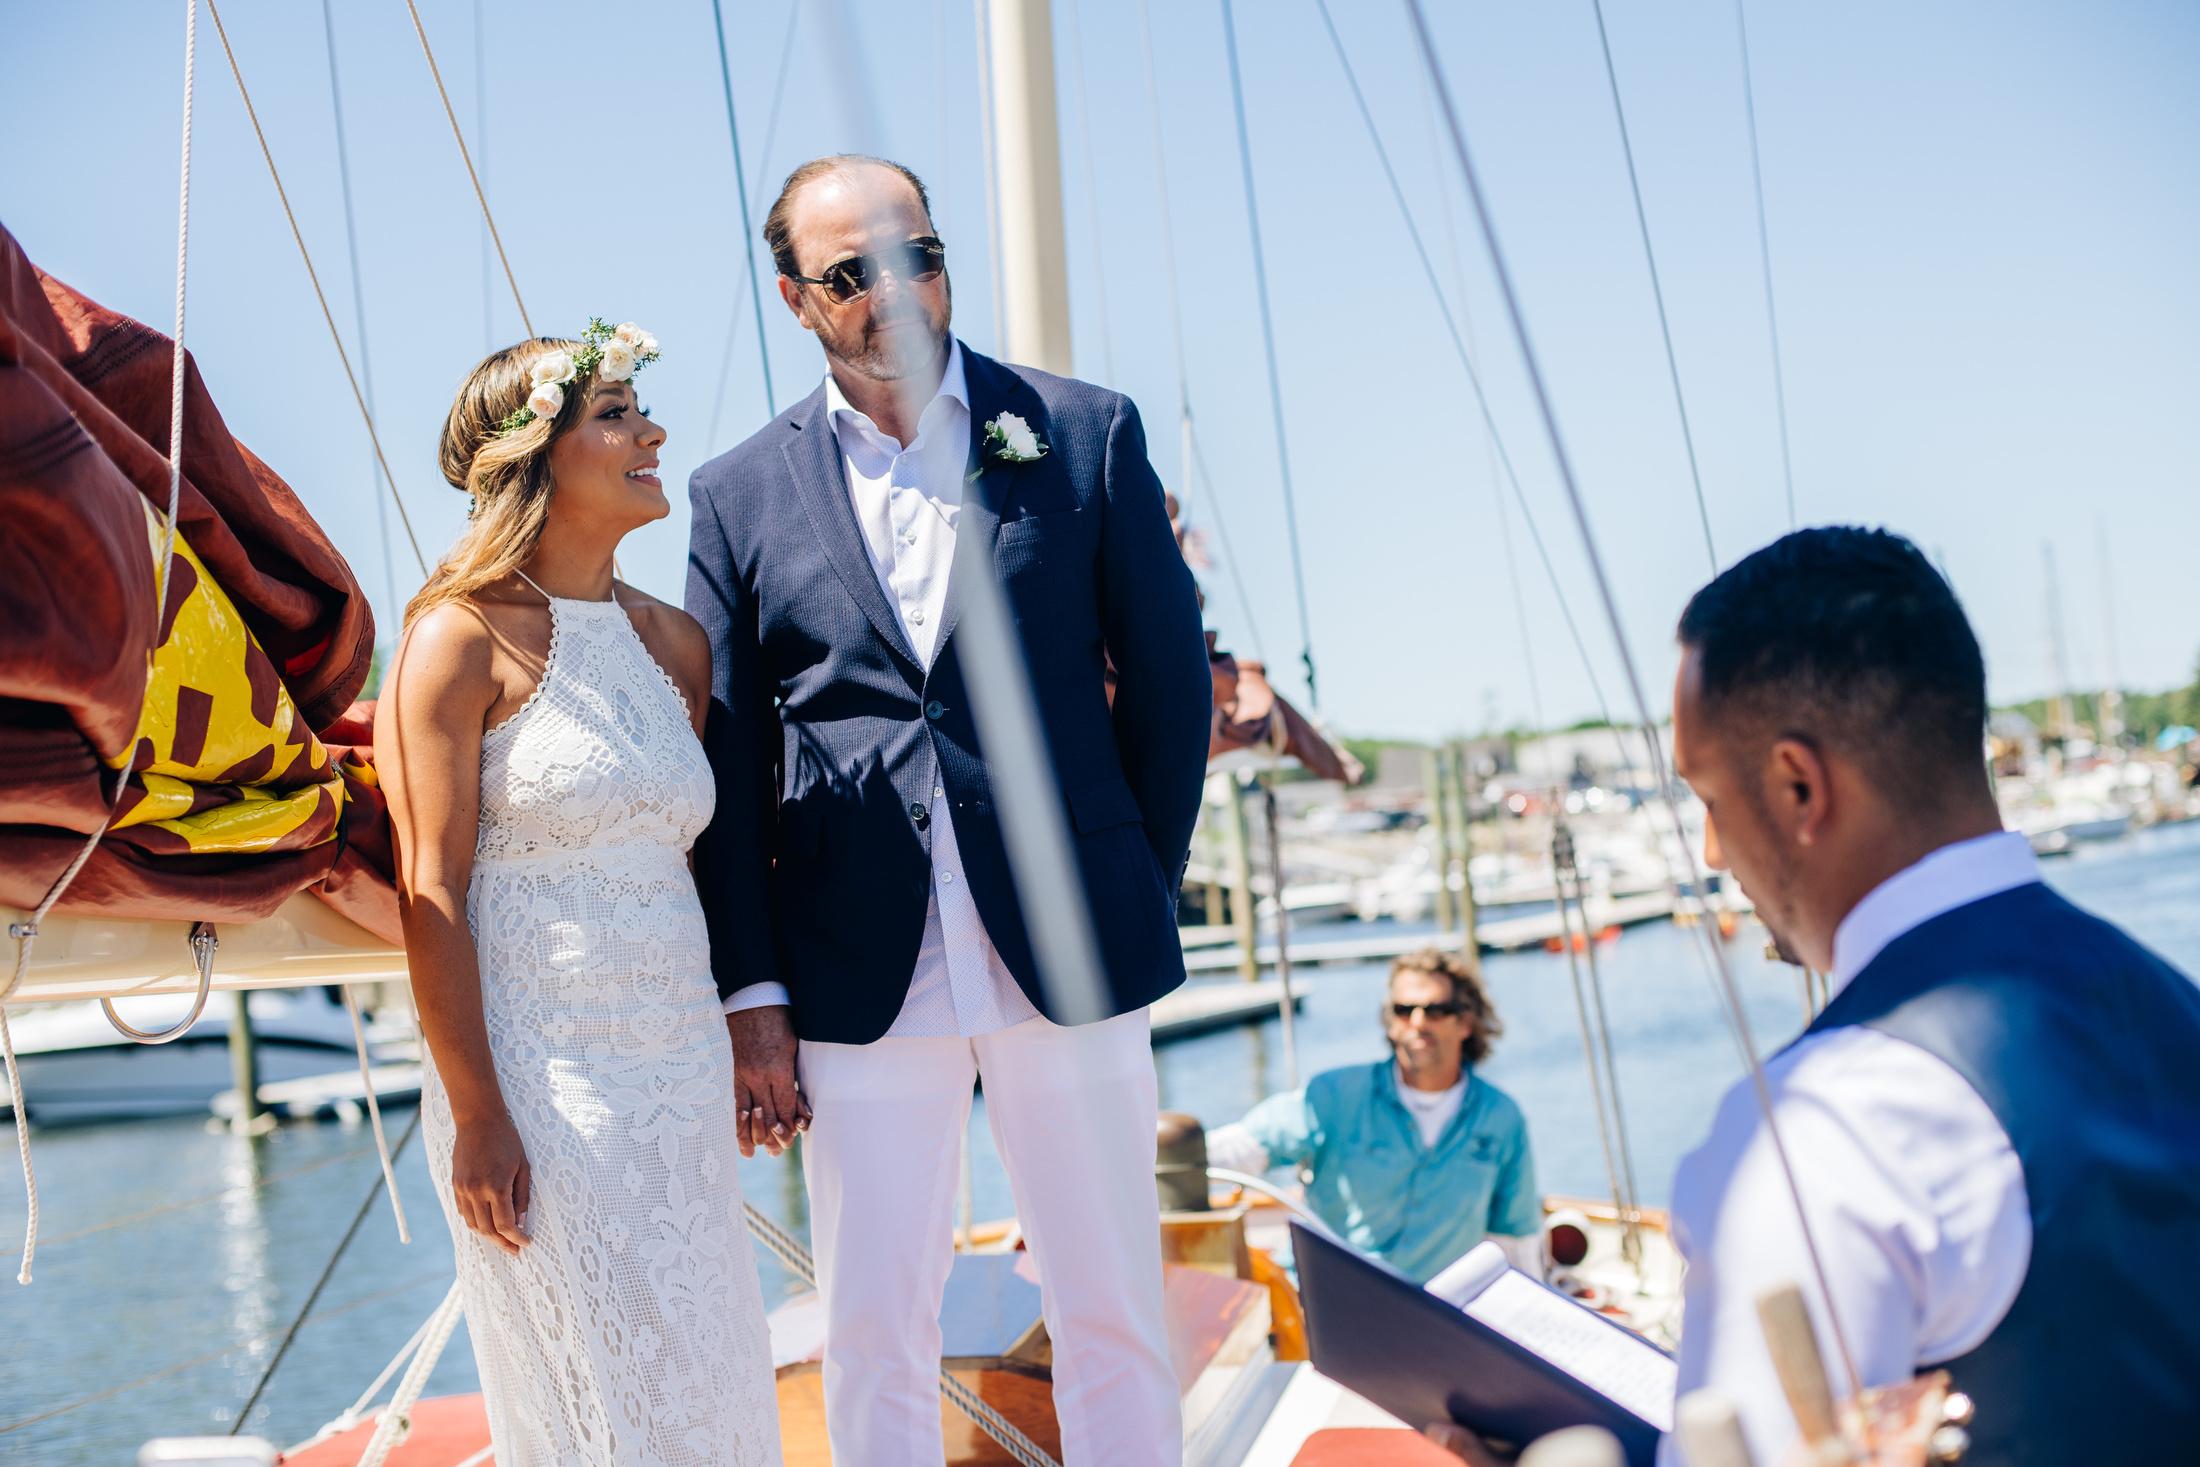 portland_maine_boat_elopement_photography_10.JPG